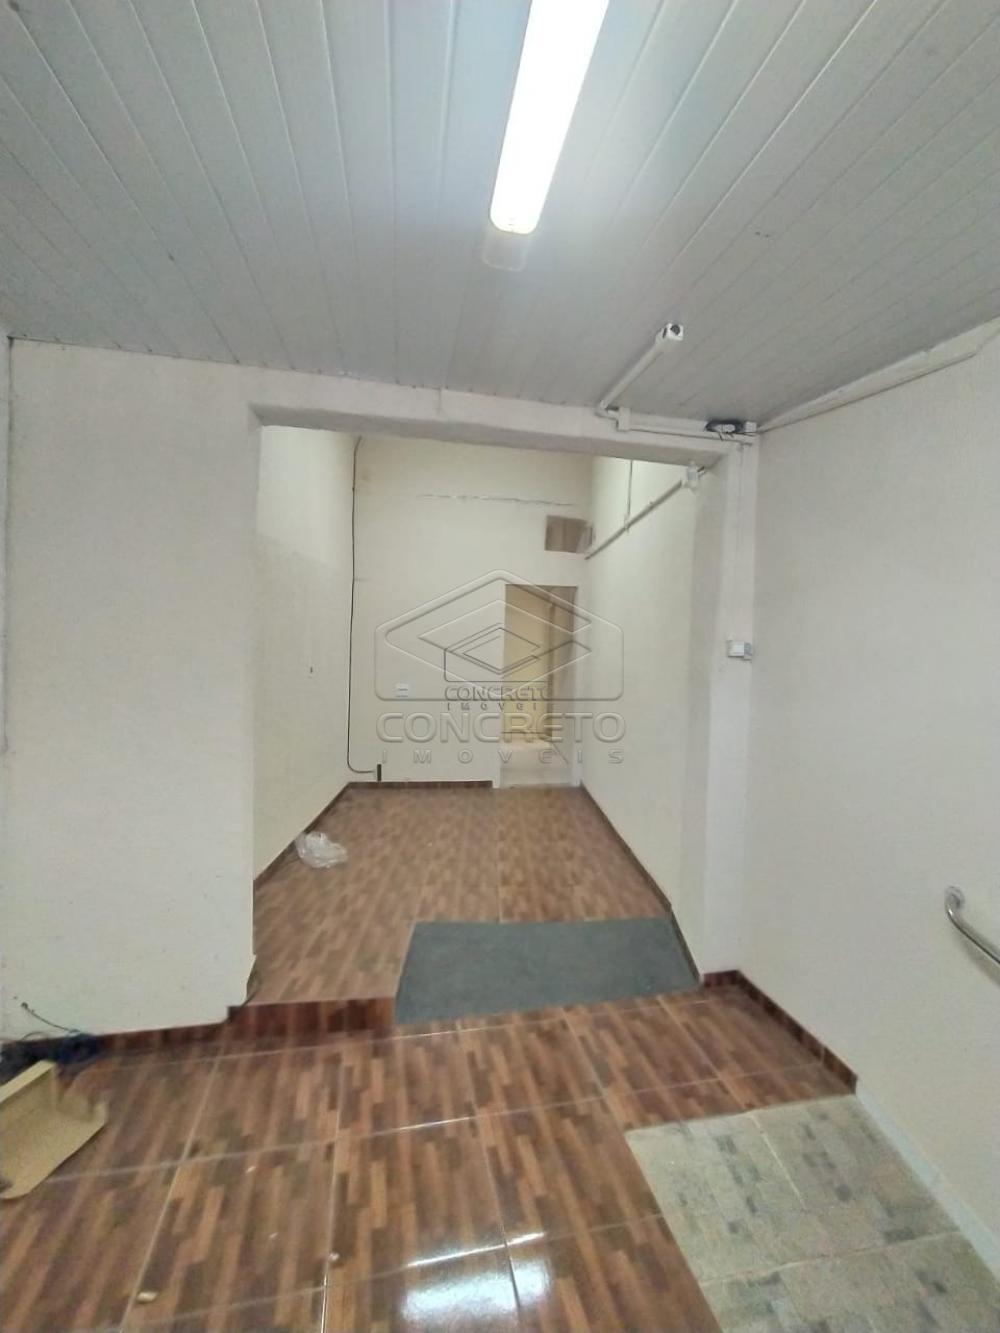 Alugar Salas/Conjuntos / Salão em Bauru R$ 650,00 - Foto 4